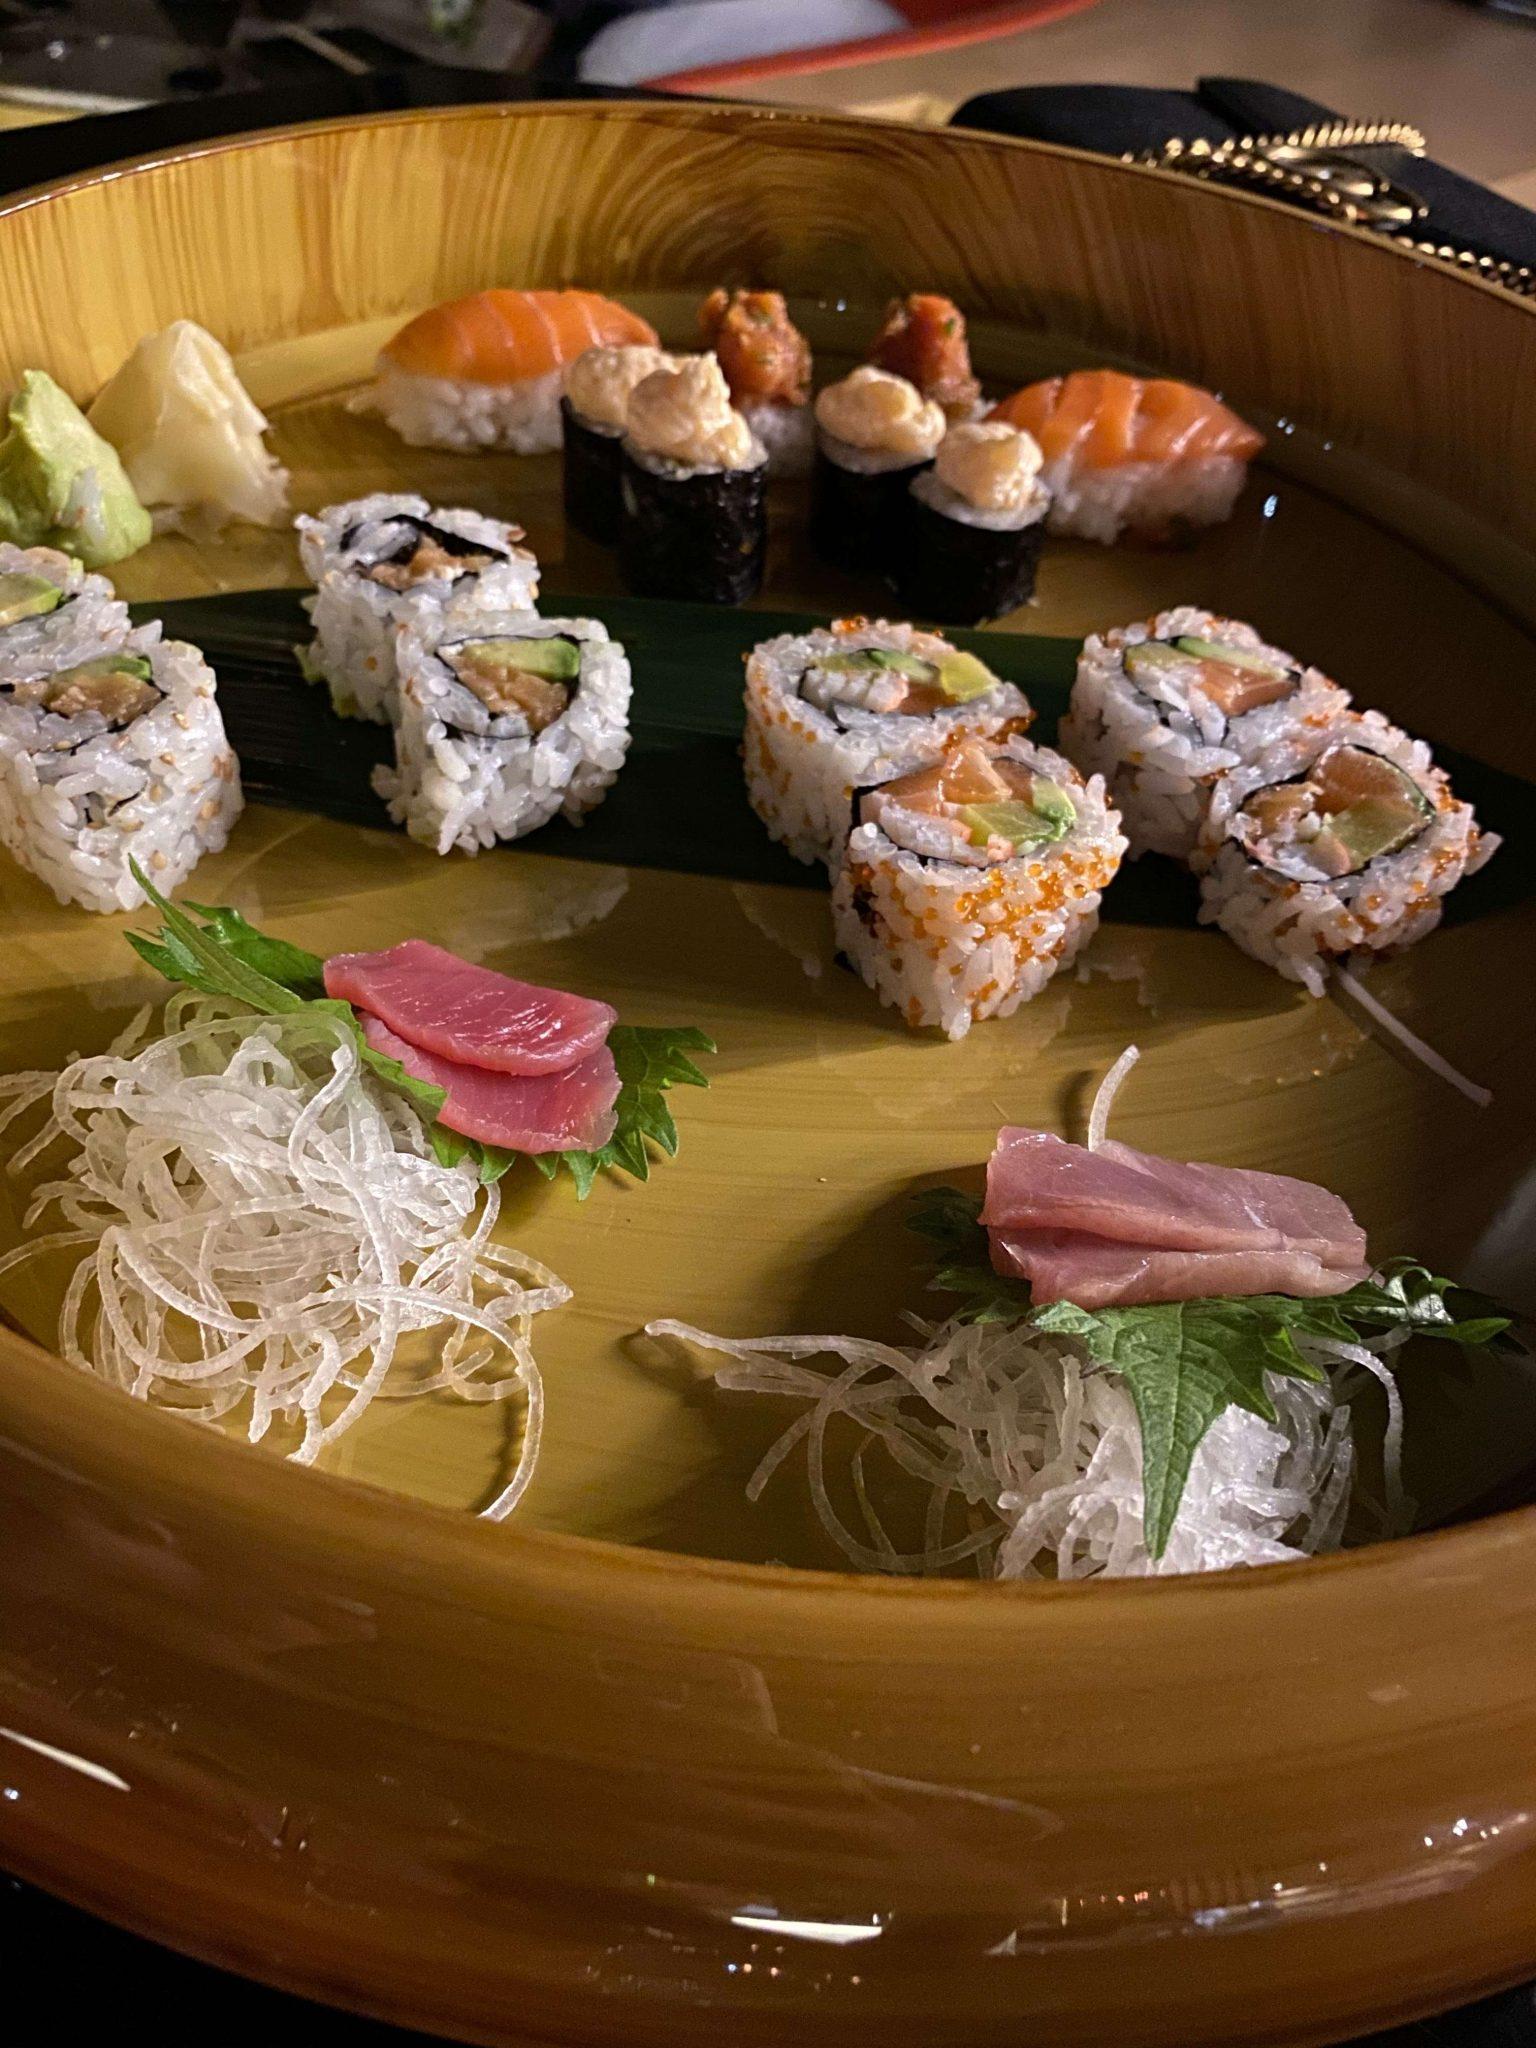 مطعم كي يو او الياباني